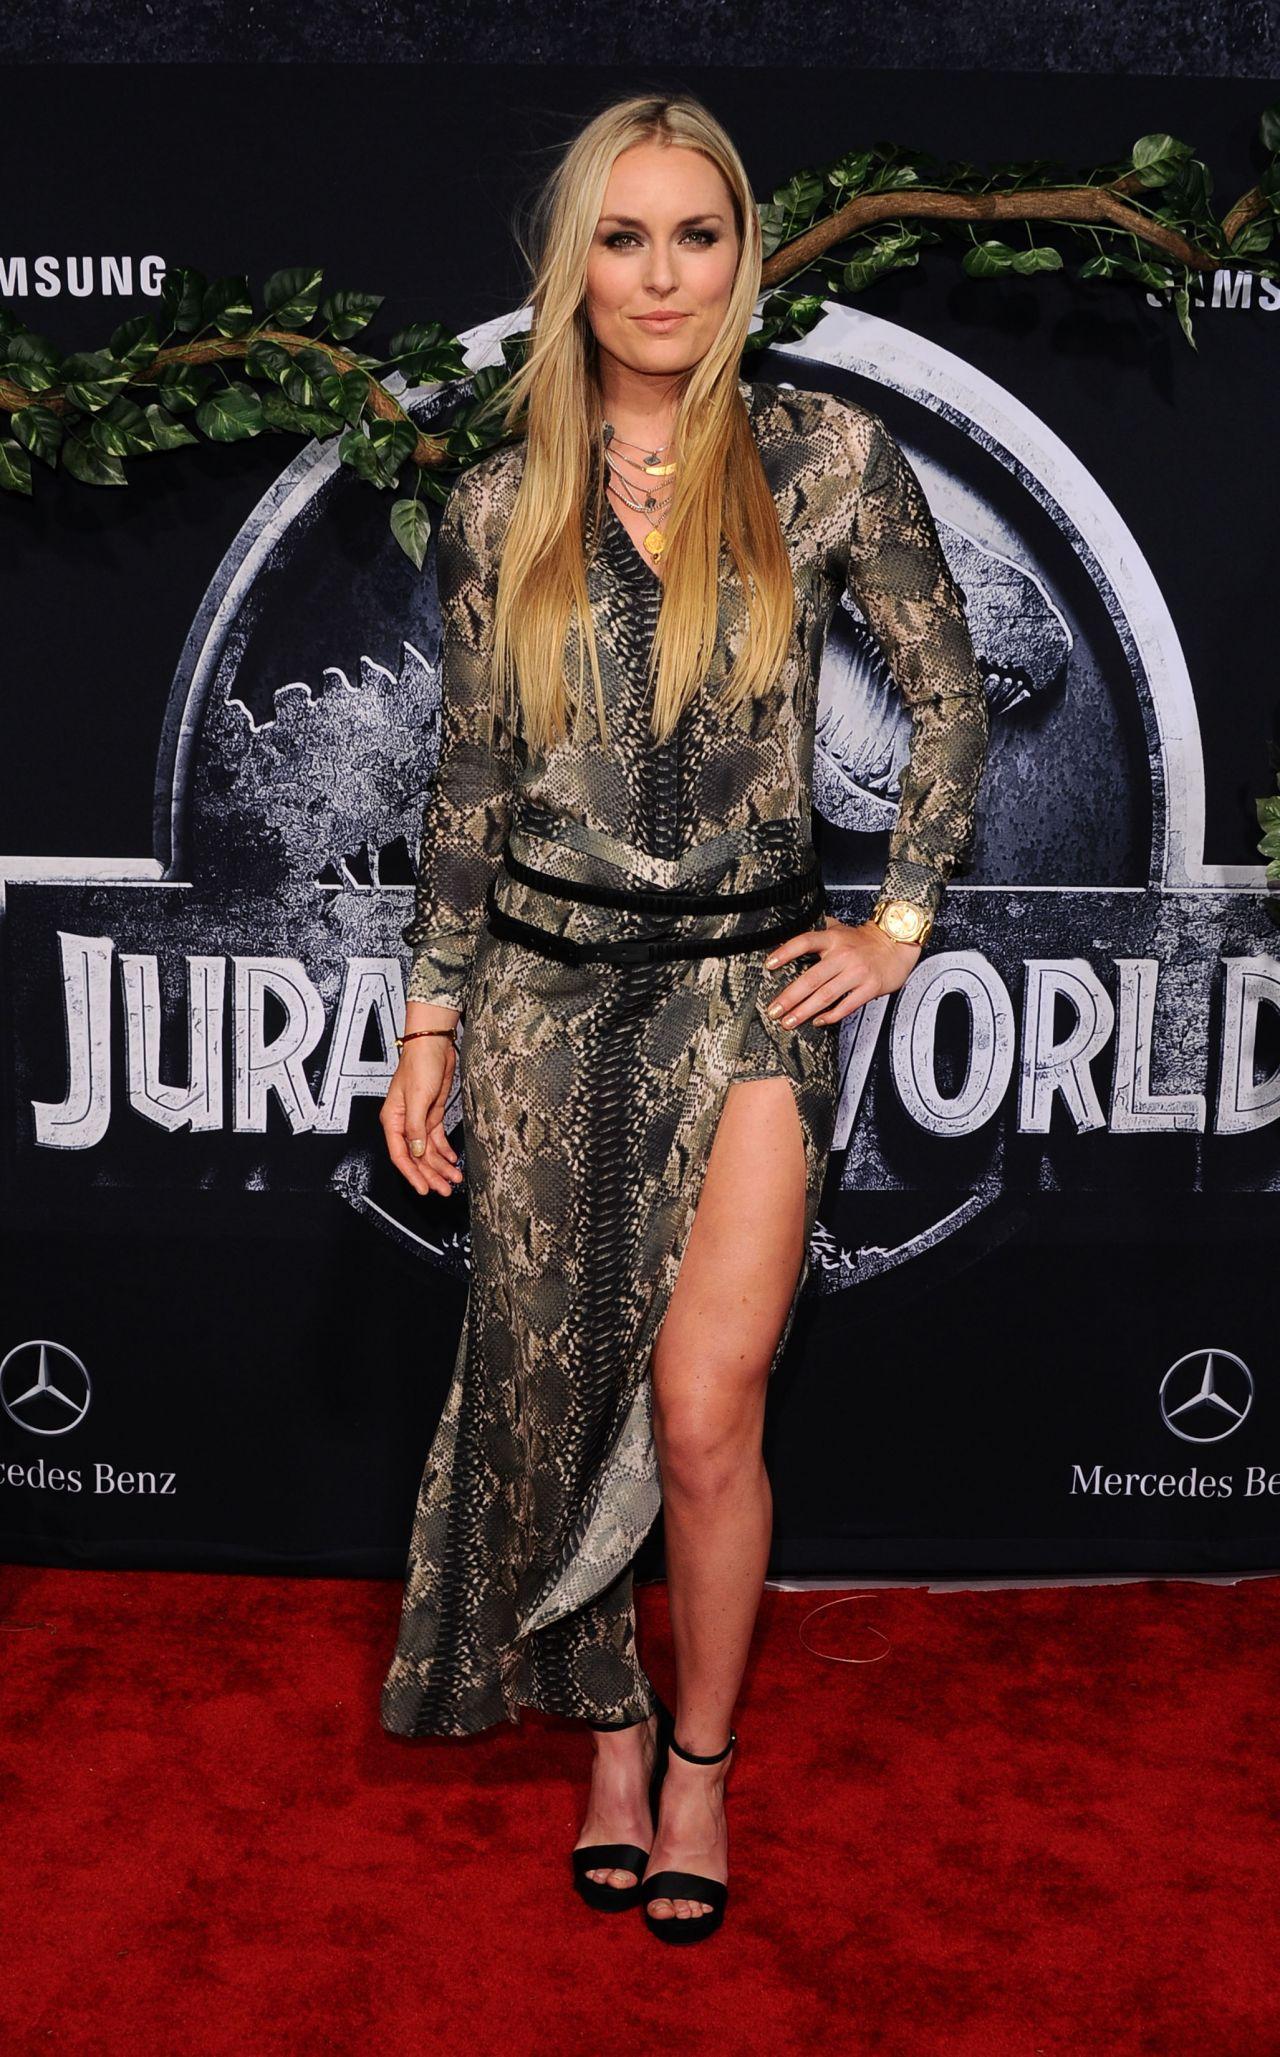 Lindsey Vonn Jurassic World Premiere In Hollywood